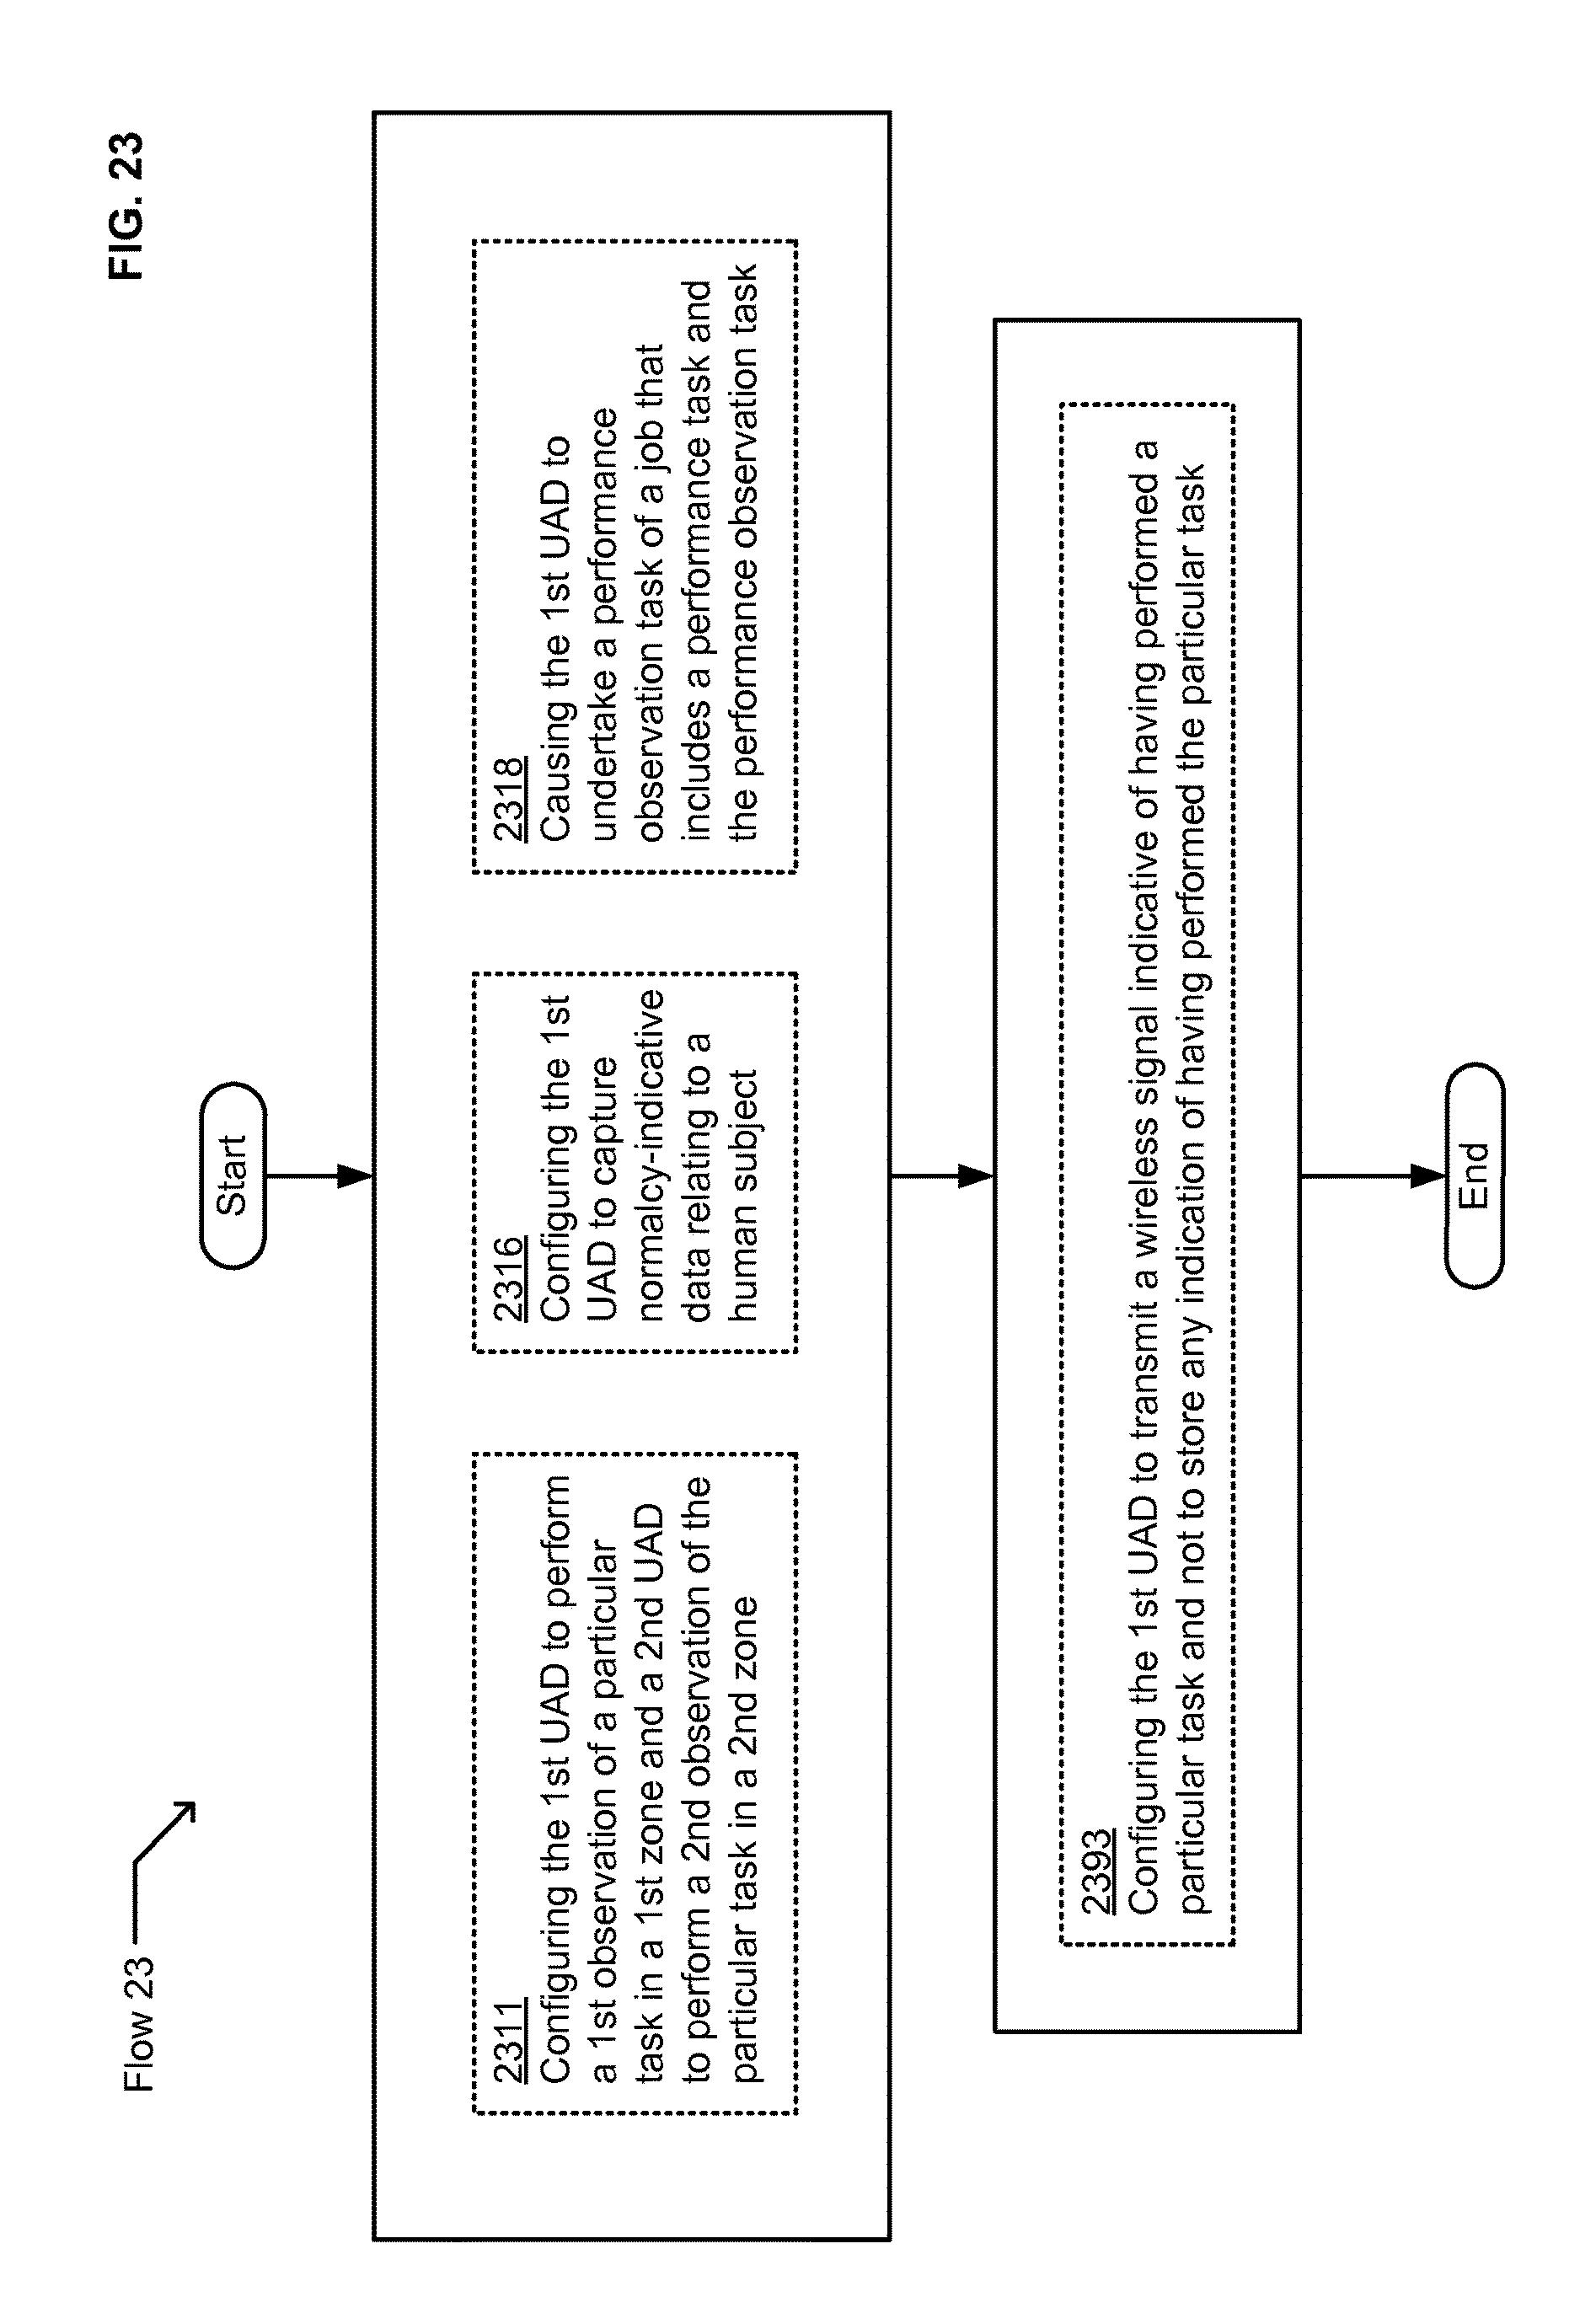 Patent US 10,019,000 B2